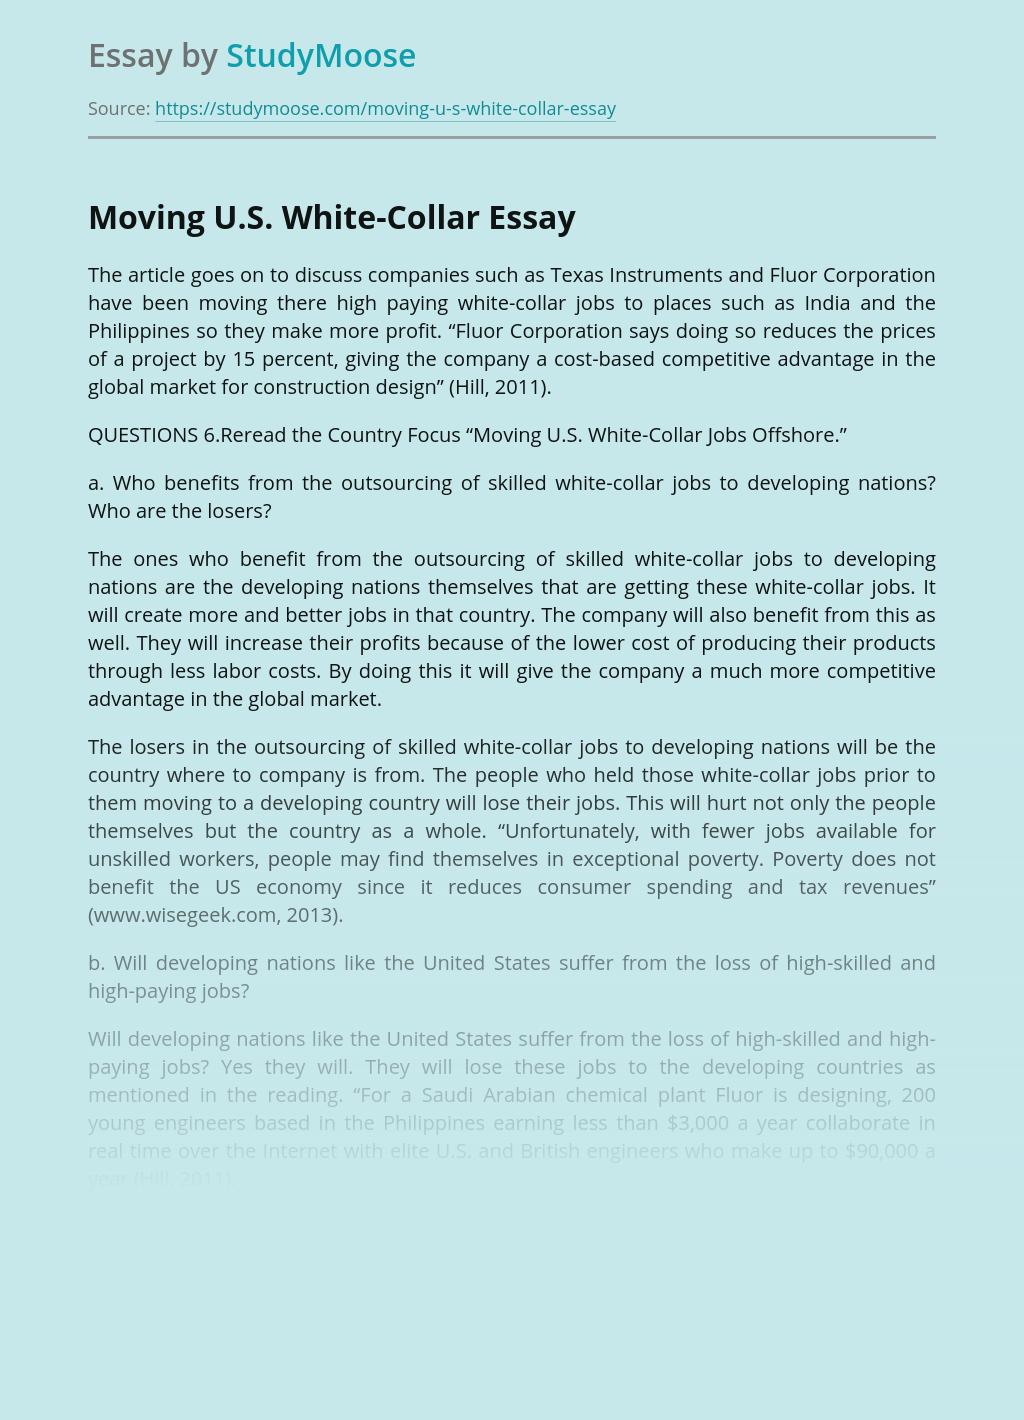 Moving U.S. White-Collar